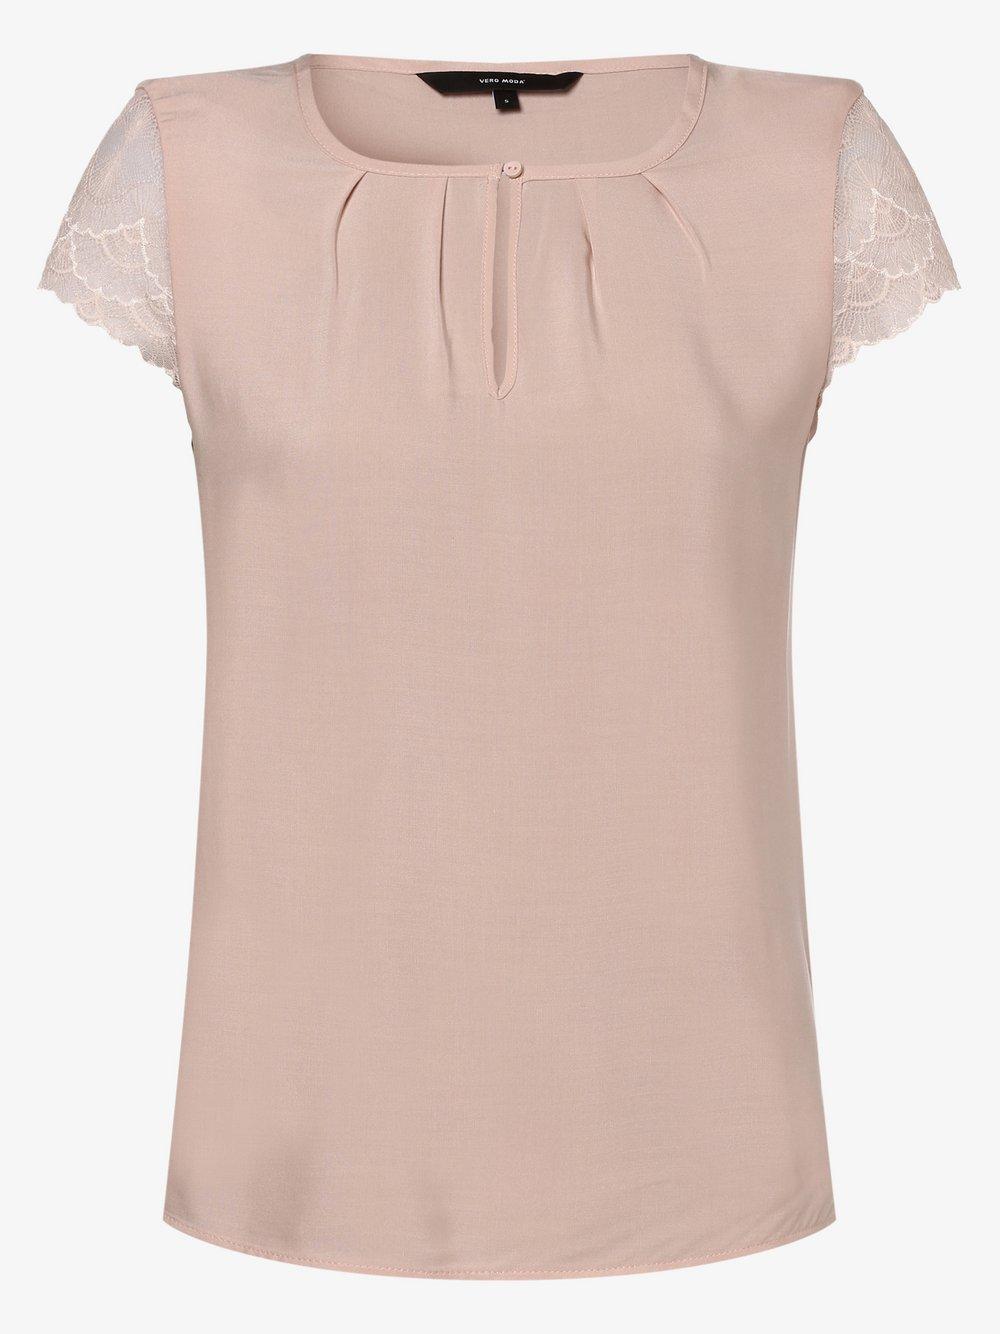 Vero Moda – Bluzka damska – Vmnina, różowy Van Graaf 466450-0001-09970